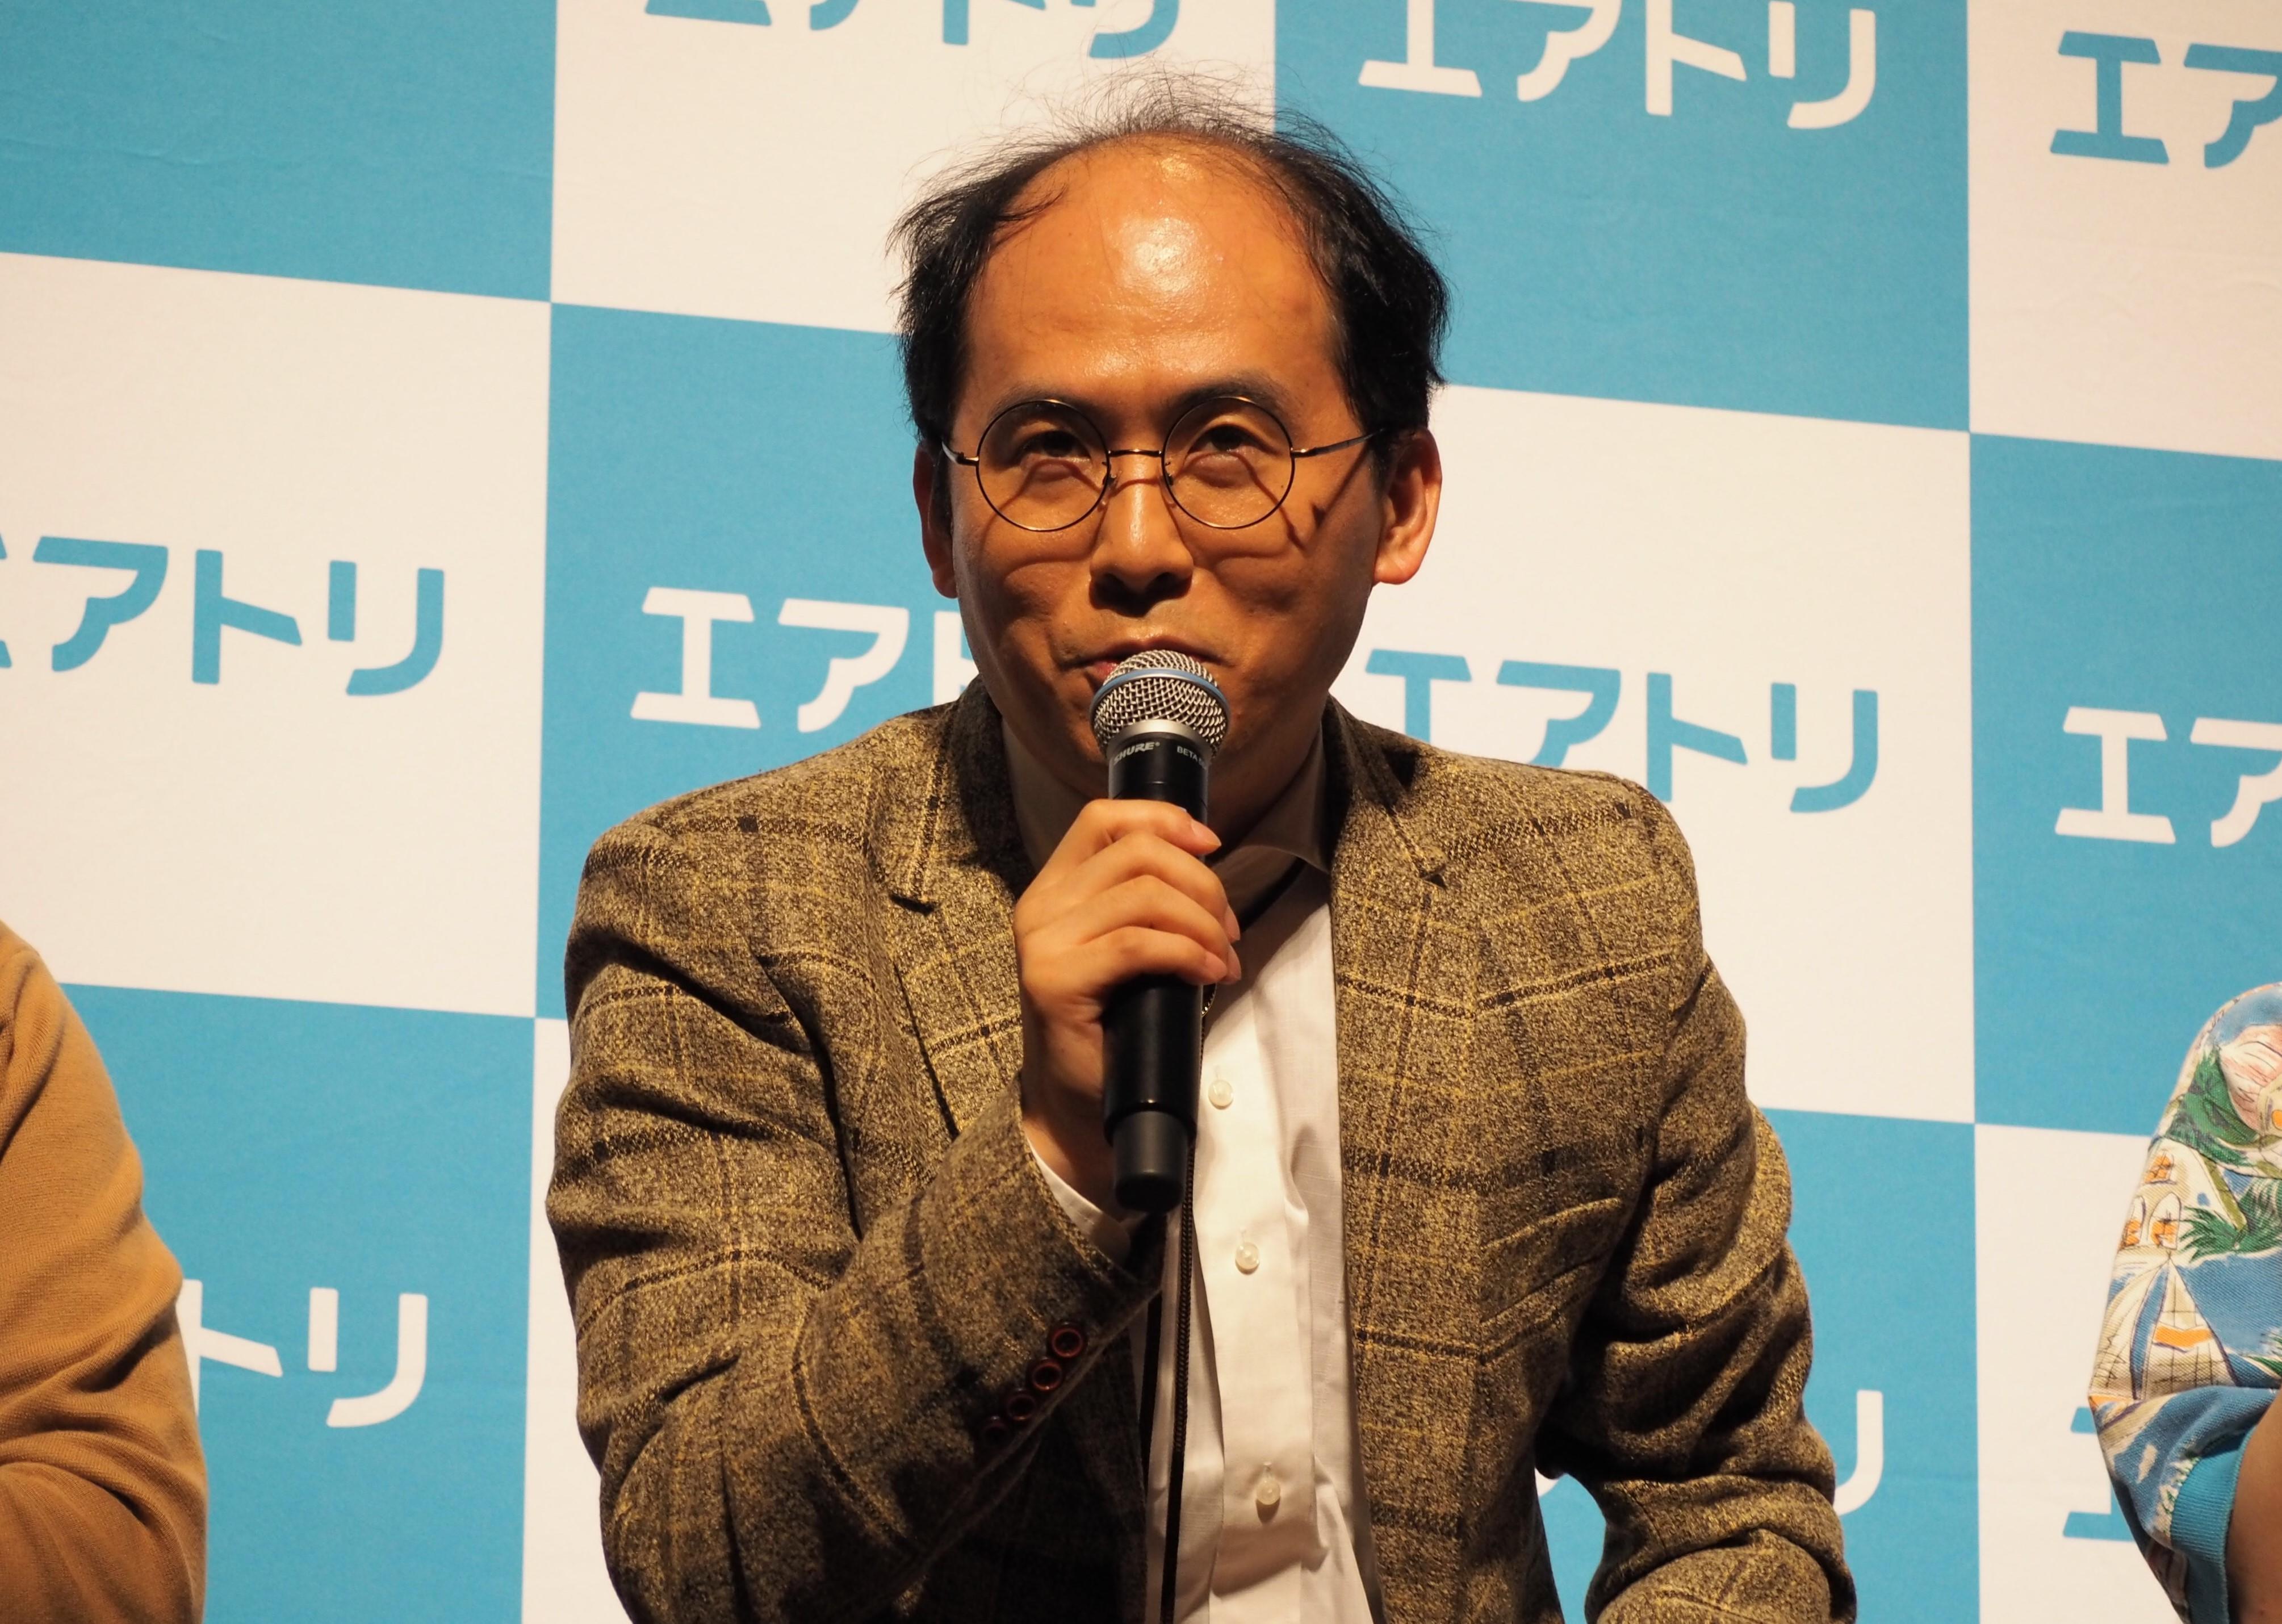 http://news.yoshimoto.co.jp/20180614071511-687f11bfbdec1cd11f7efa05645a074f37e616aa.jpg